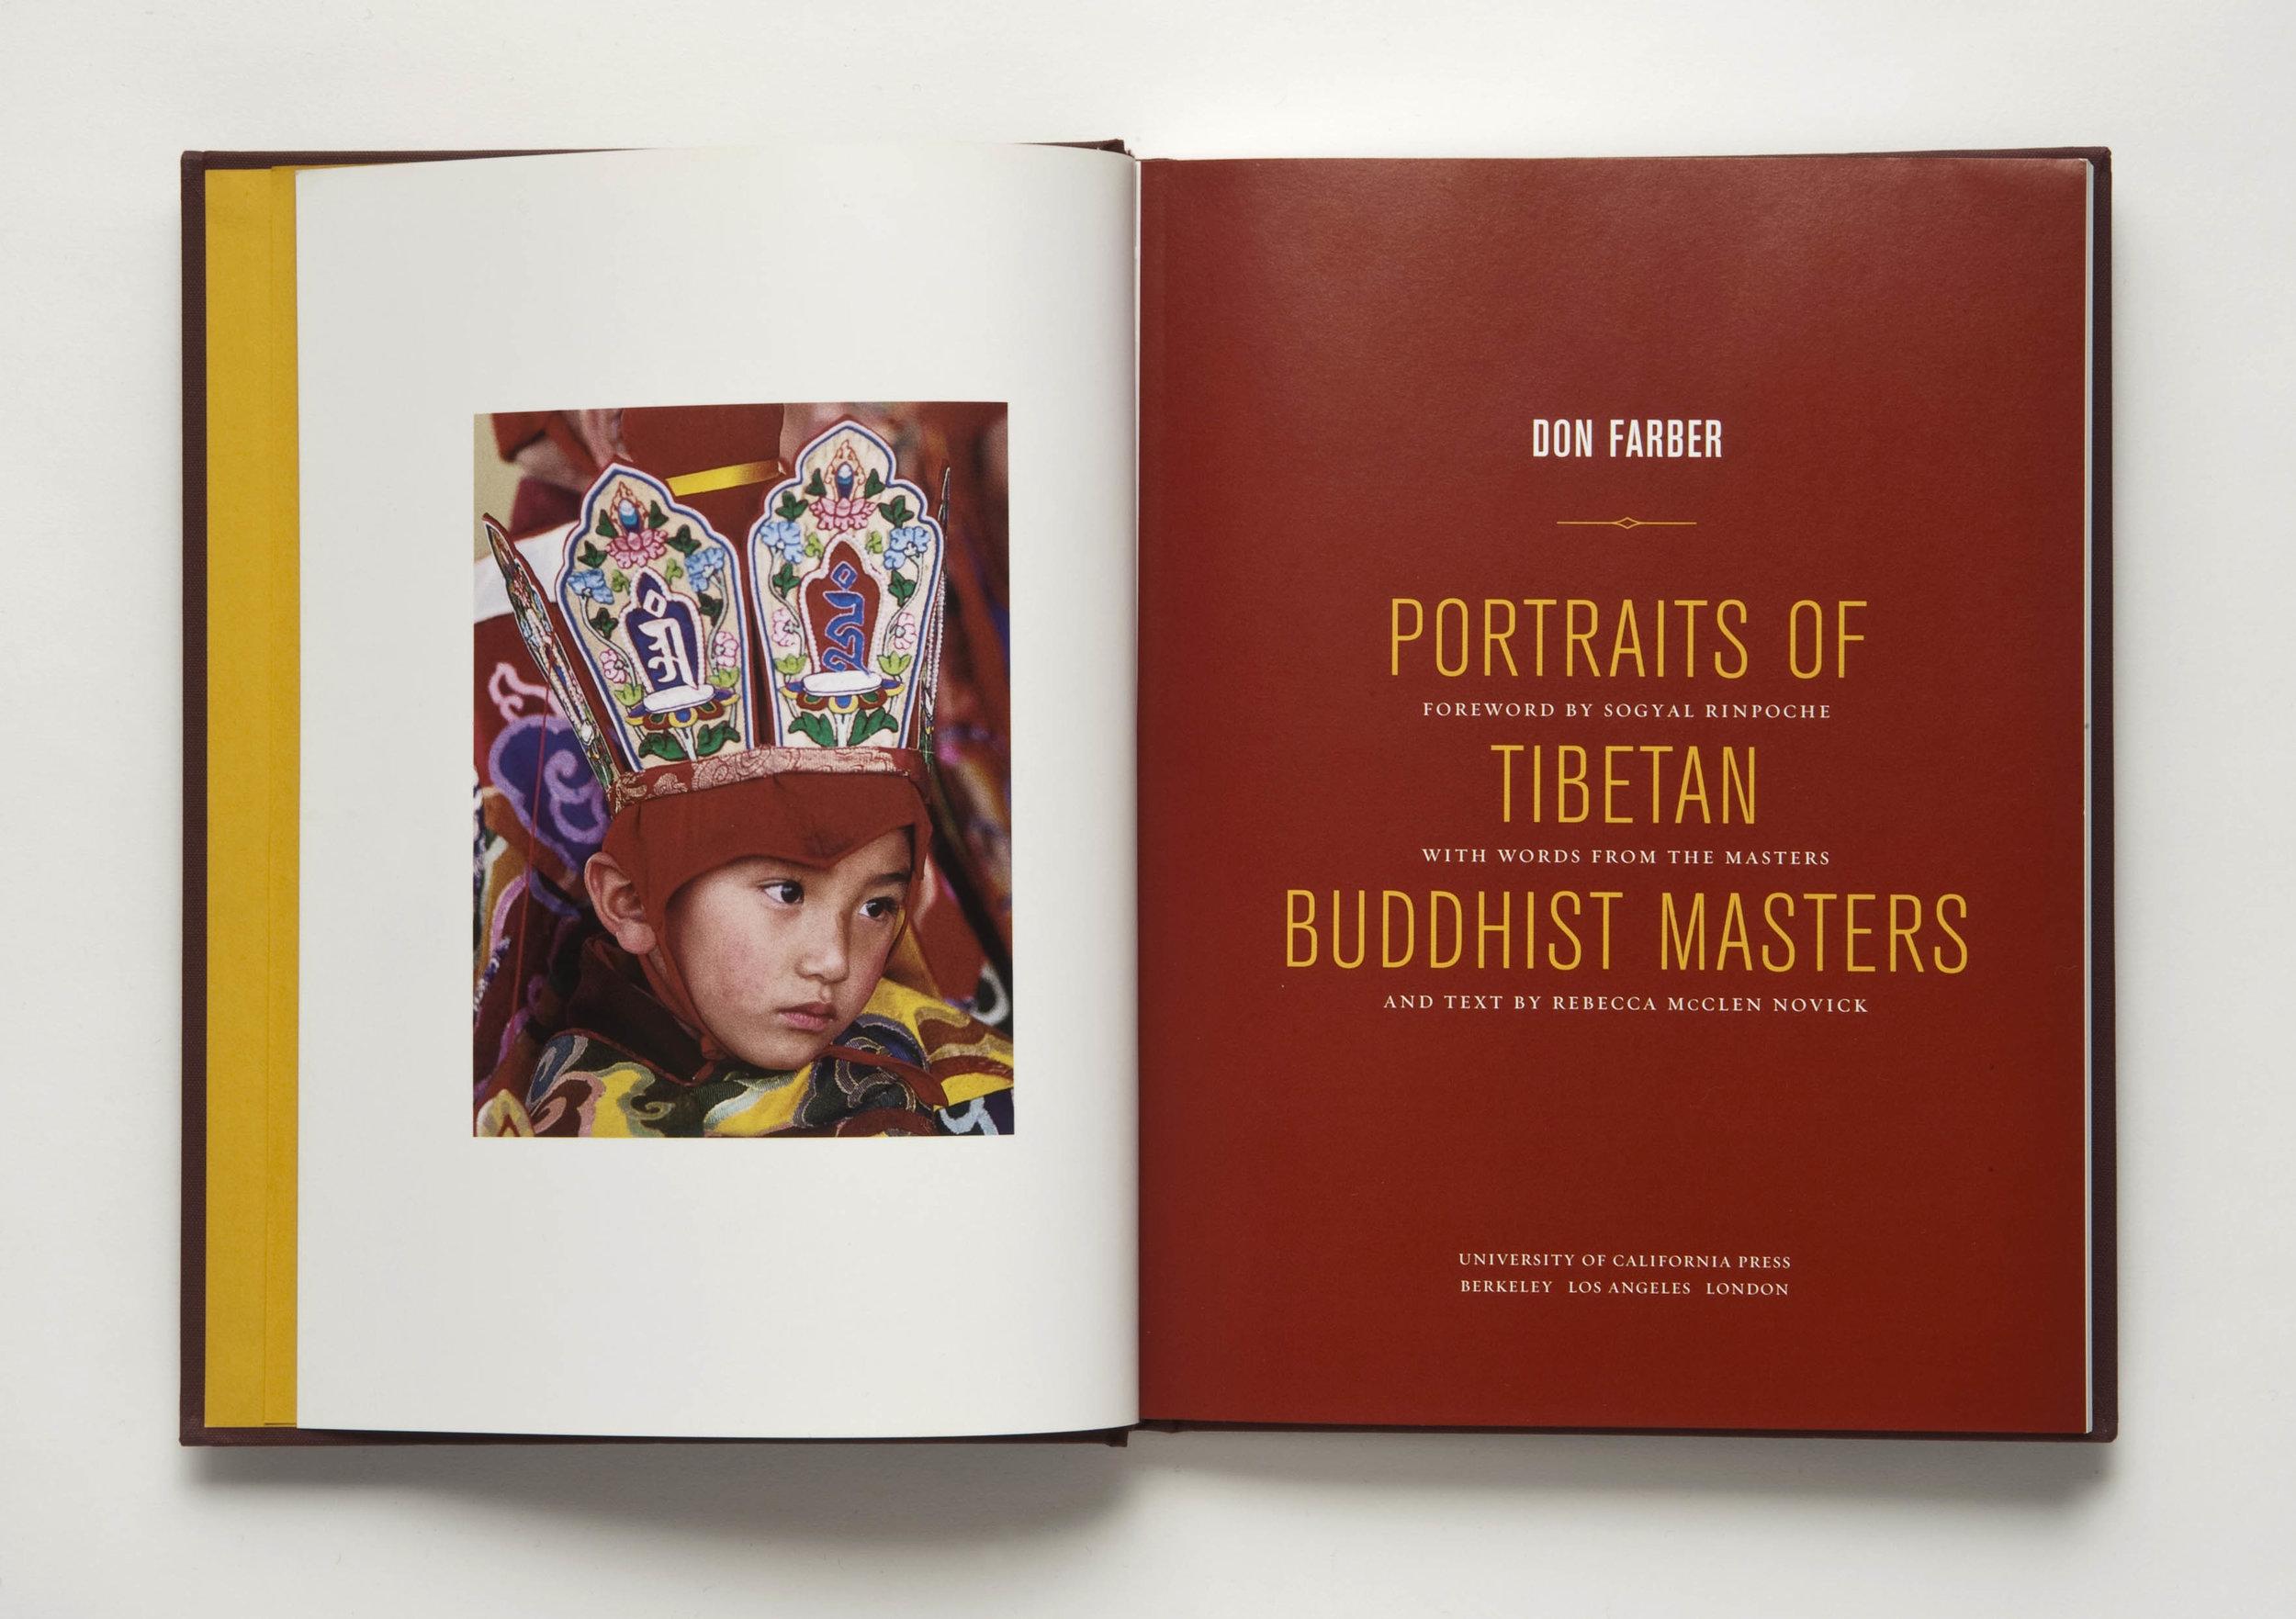 portraits-of-tibetan-buddhist-masters1.jpg